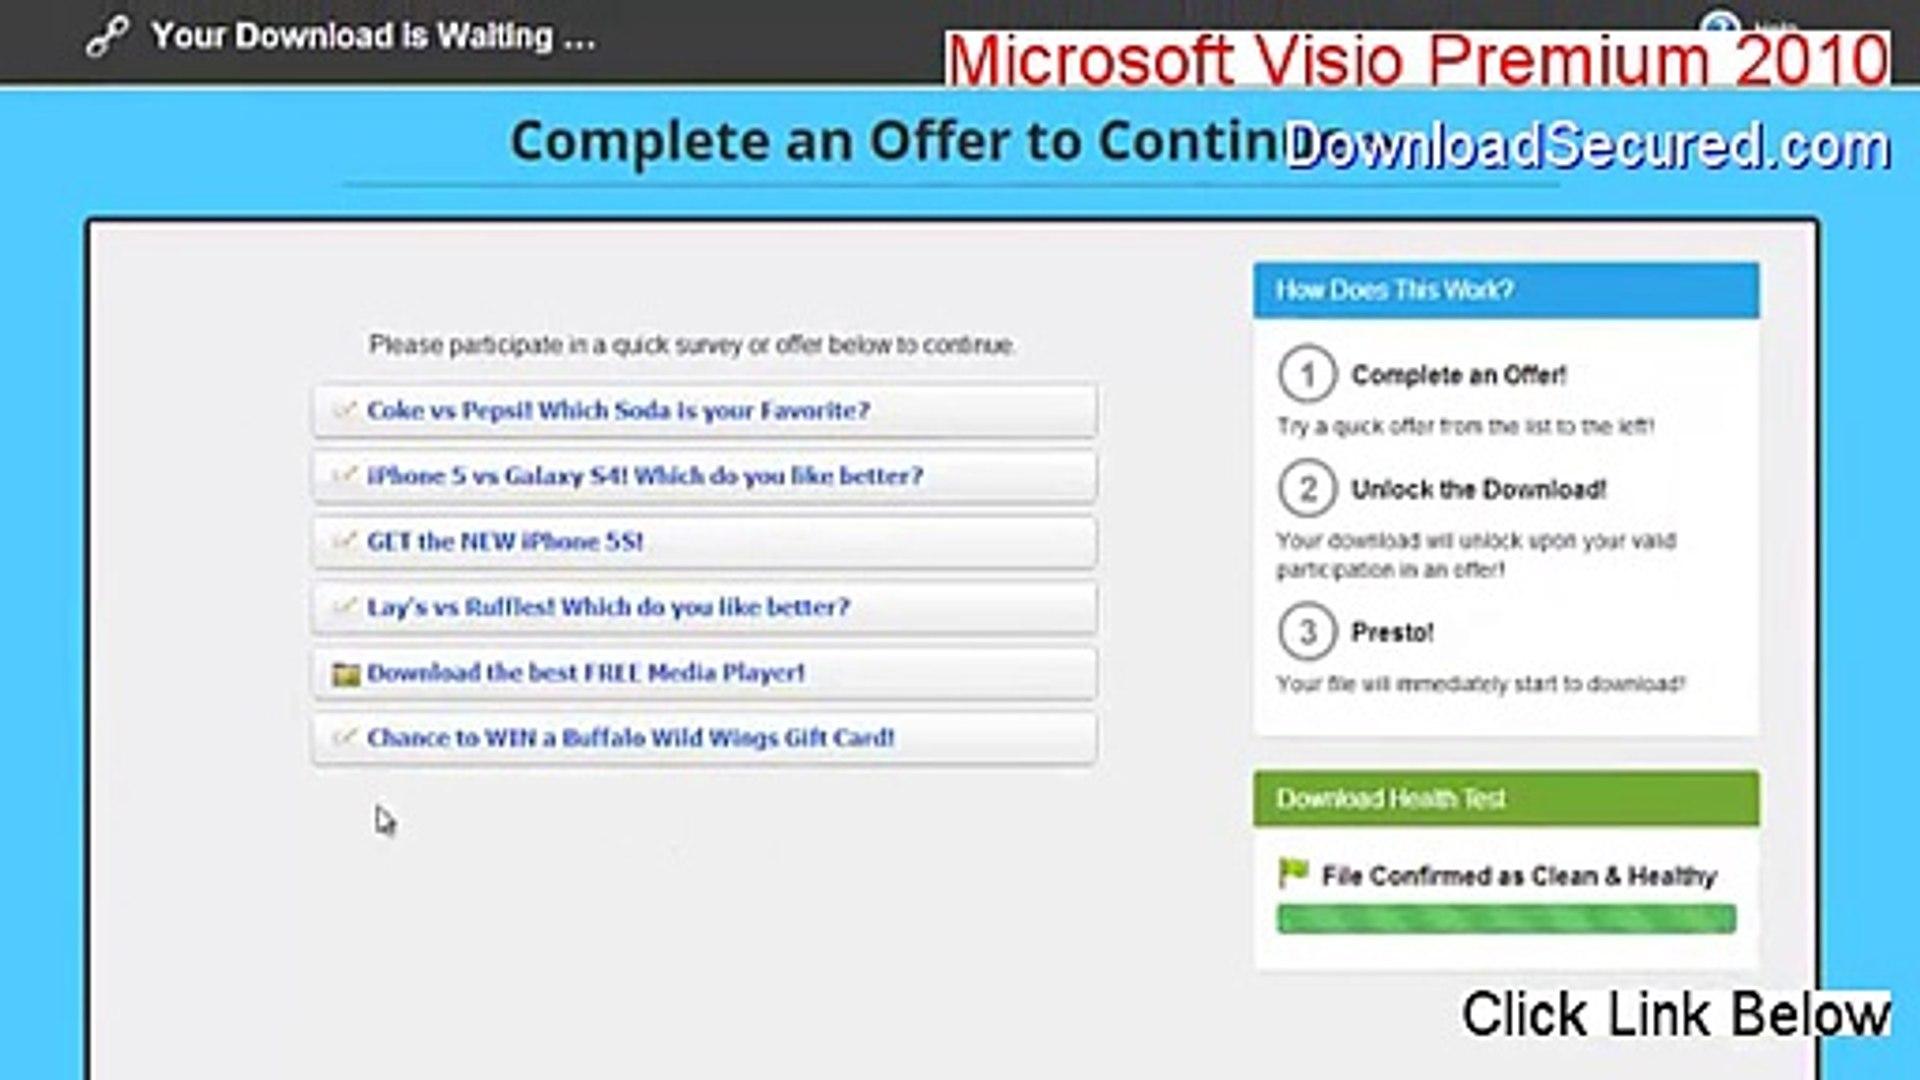 visio 2010 sp1 download 32 bit